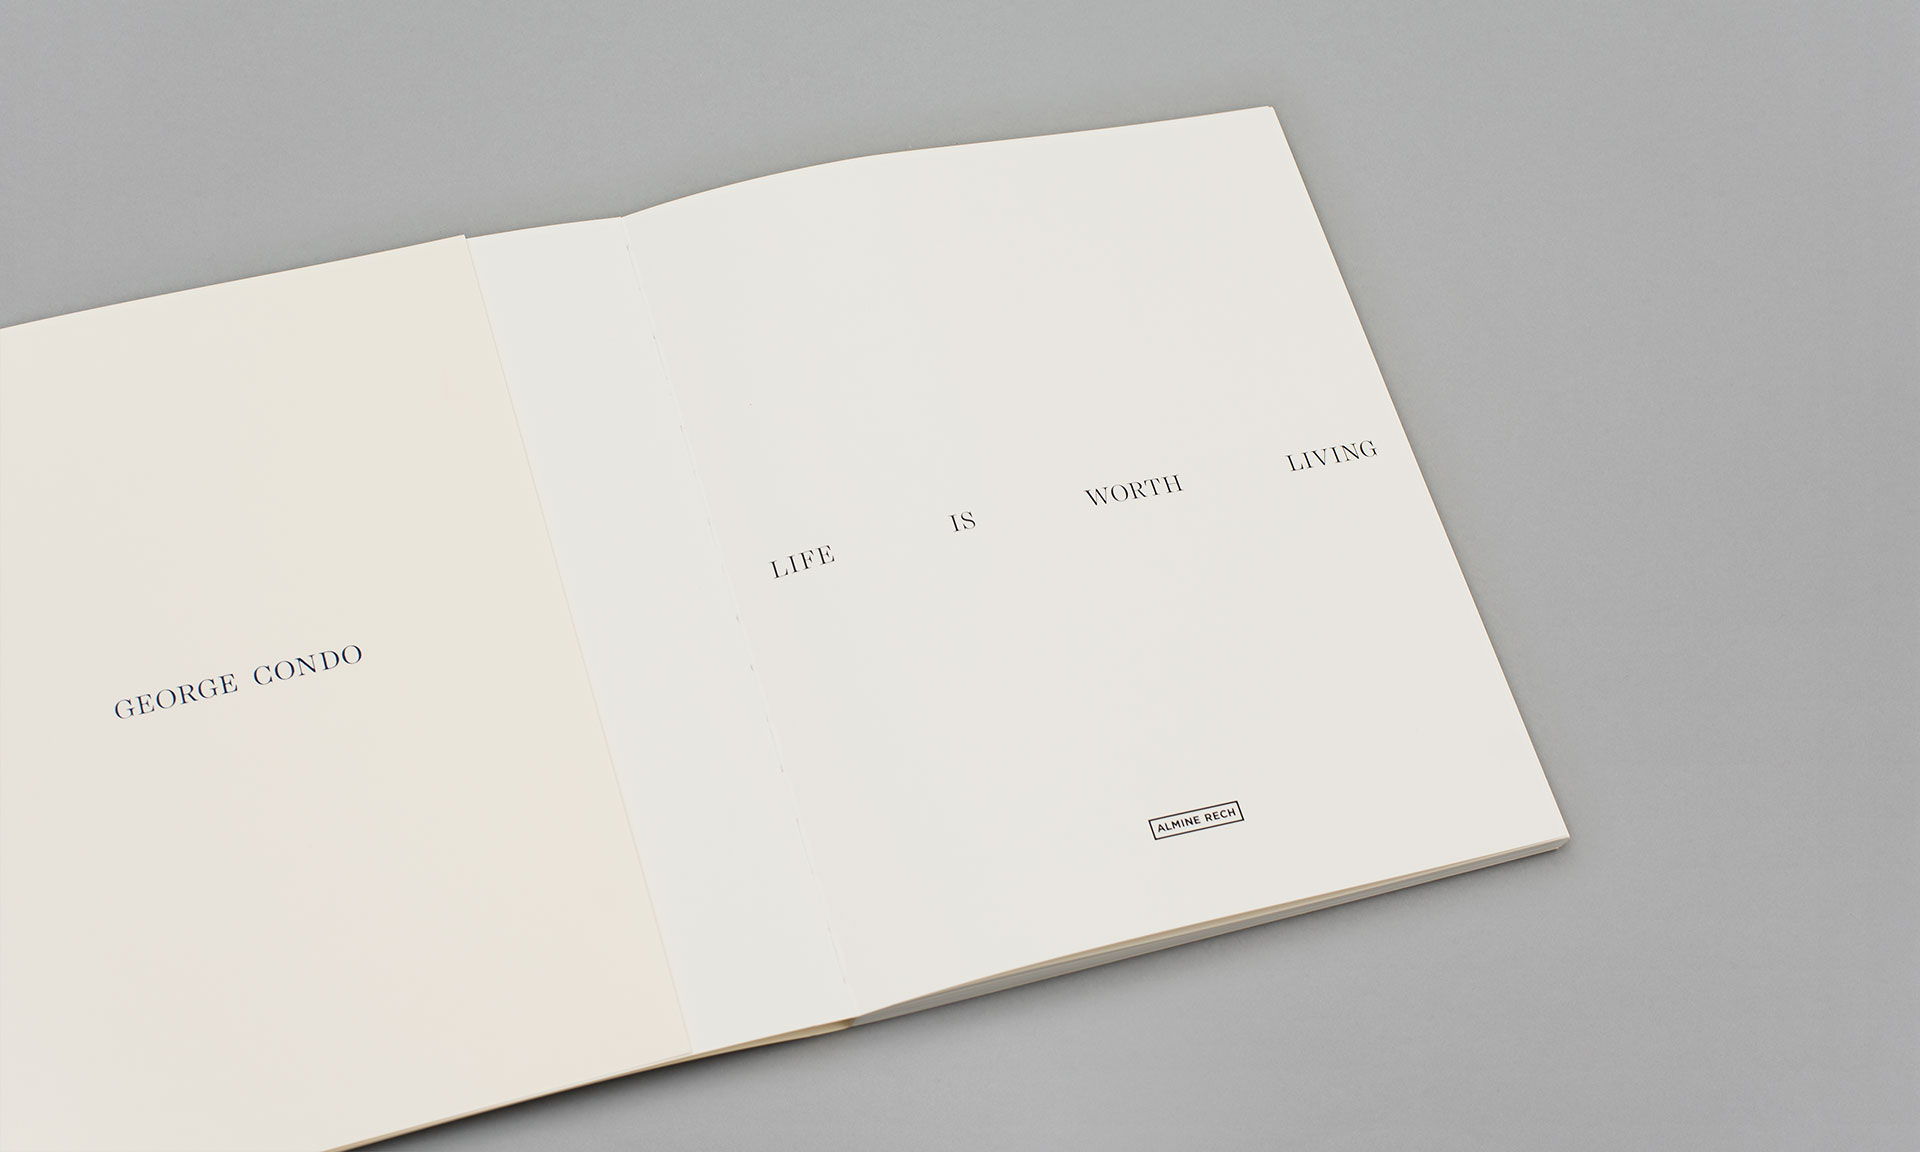 Condo_Life_05